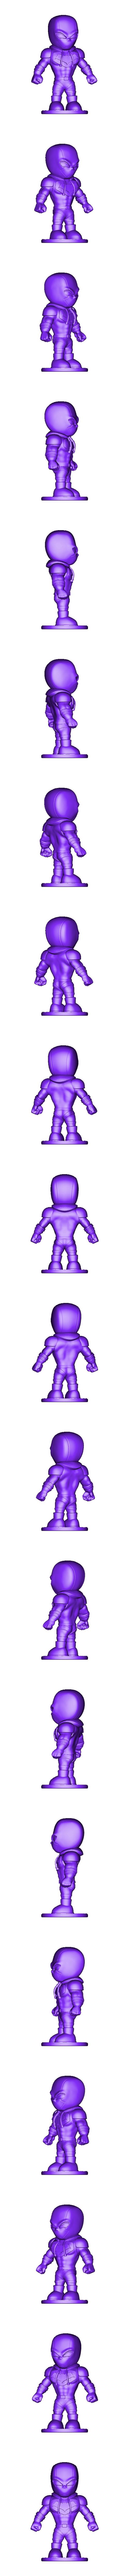 red.stl Descargar archivo STL Redhood chibi / Gotham Knight • Plan para la impresión en 3D, MatteoMoscatelli